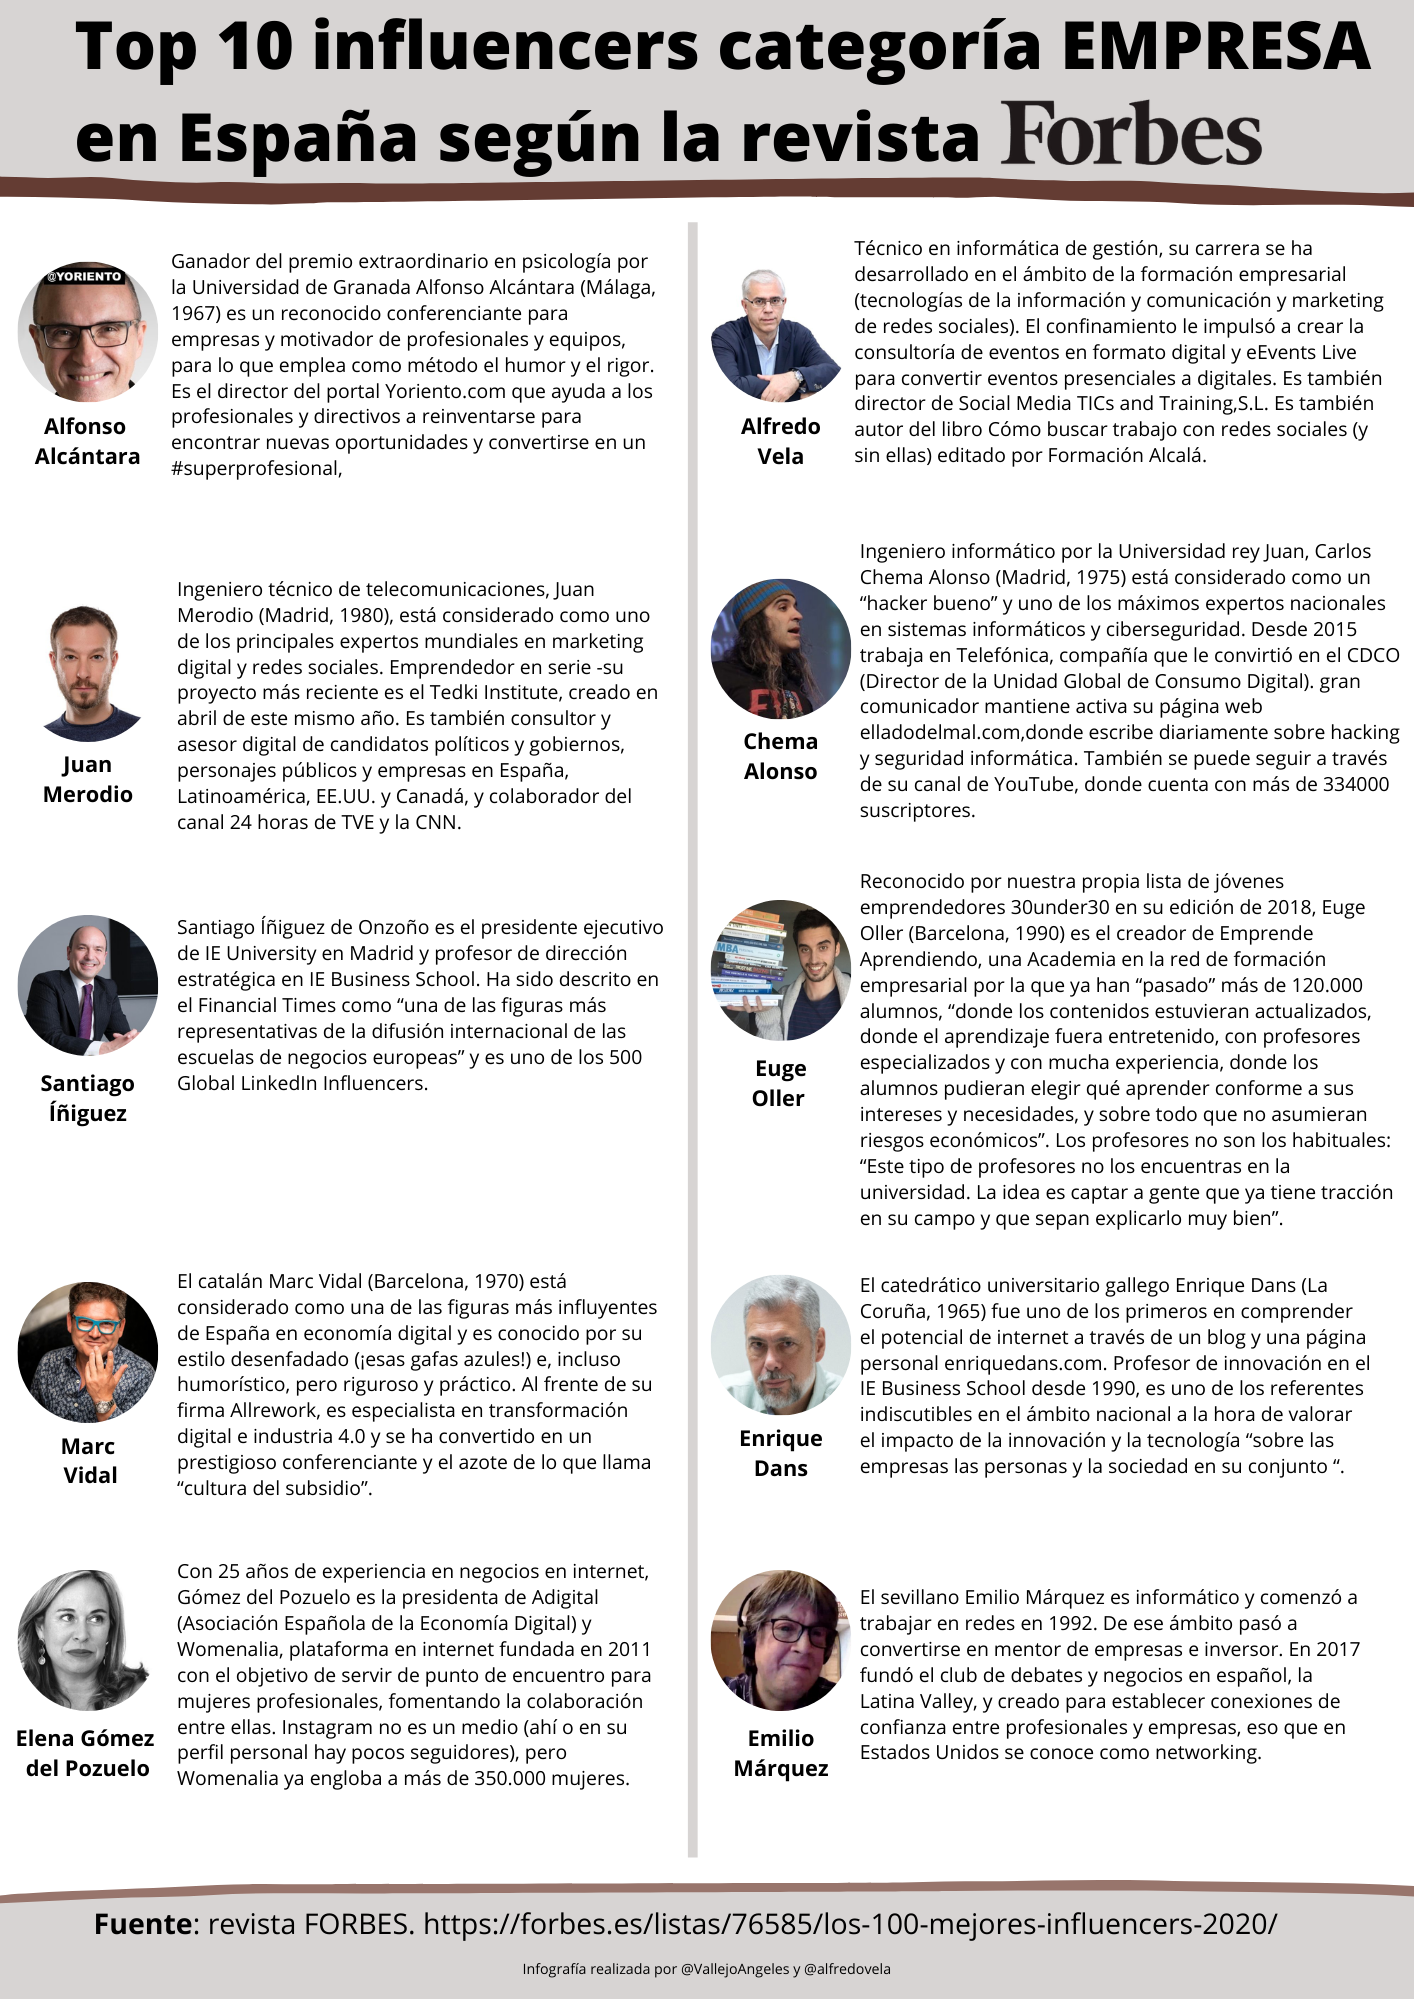 Top 10 influencers categoría EMPRESA en España según FORBES #influencers #infografía #ForbesBestInfluencers